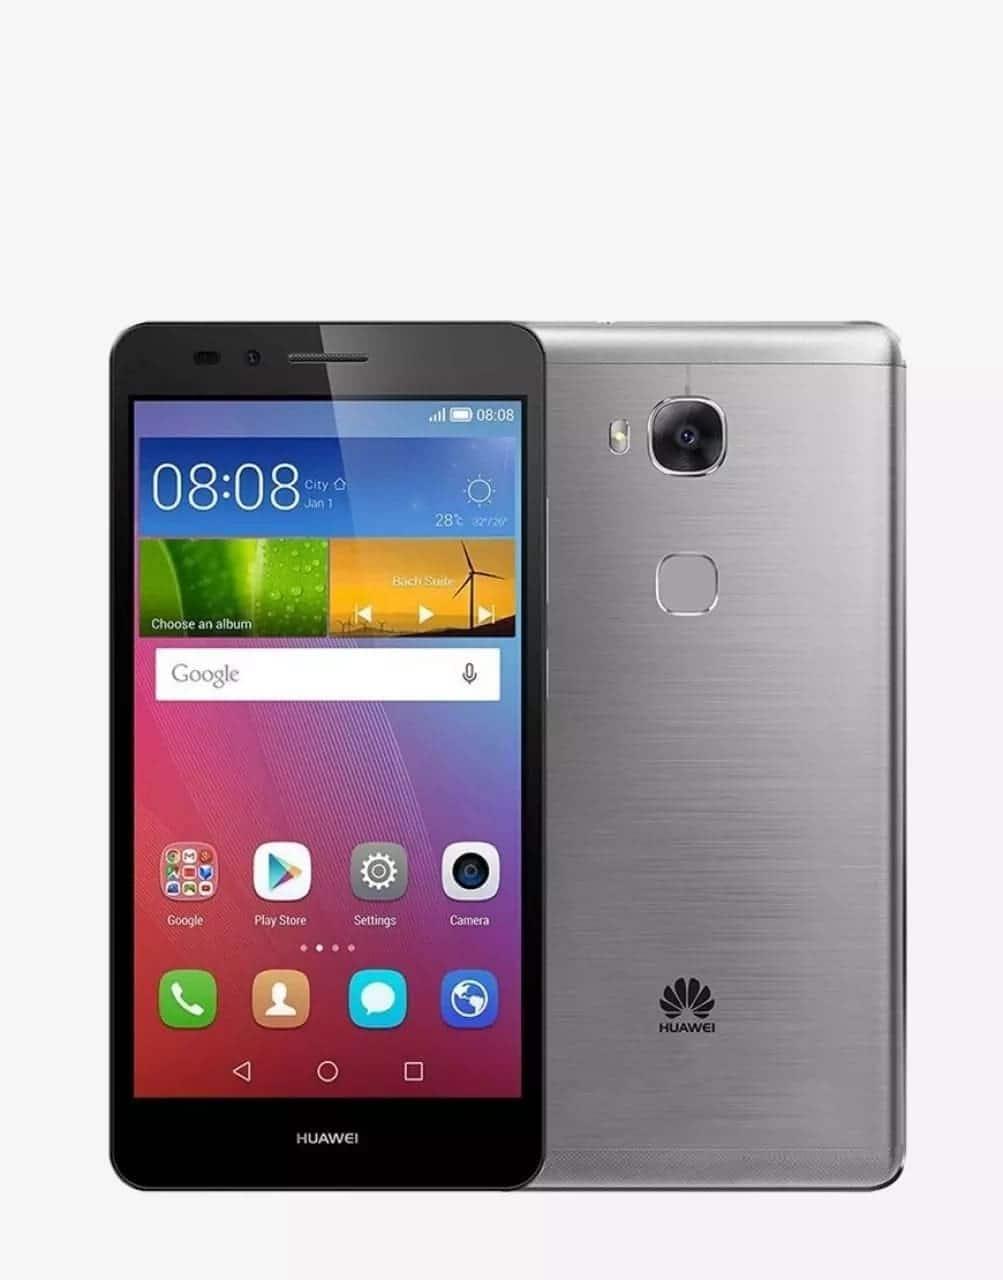 Huawei gr5 camera, Huawei gr5 battery life, Huawei gr5 specification